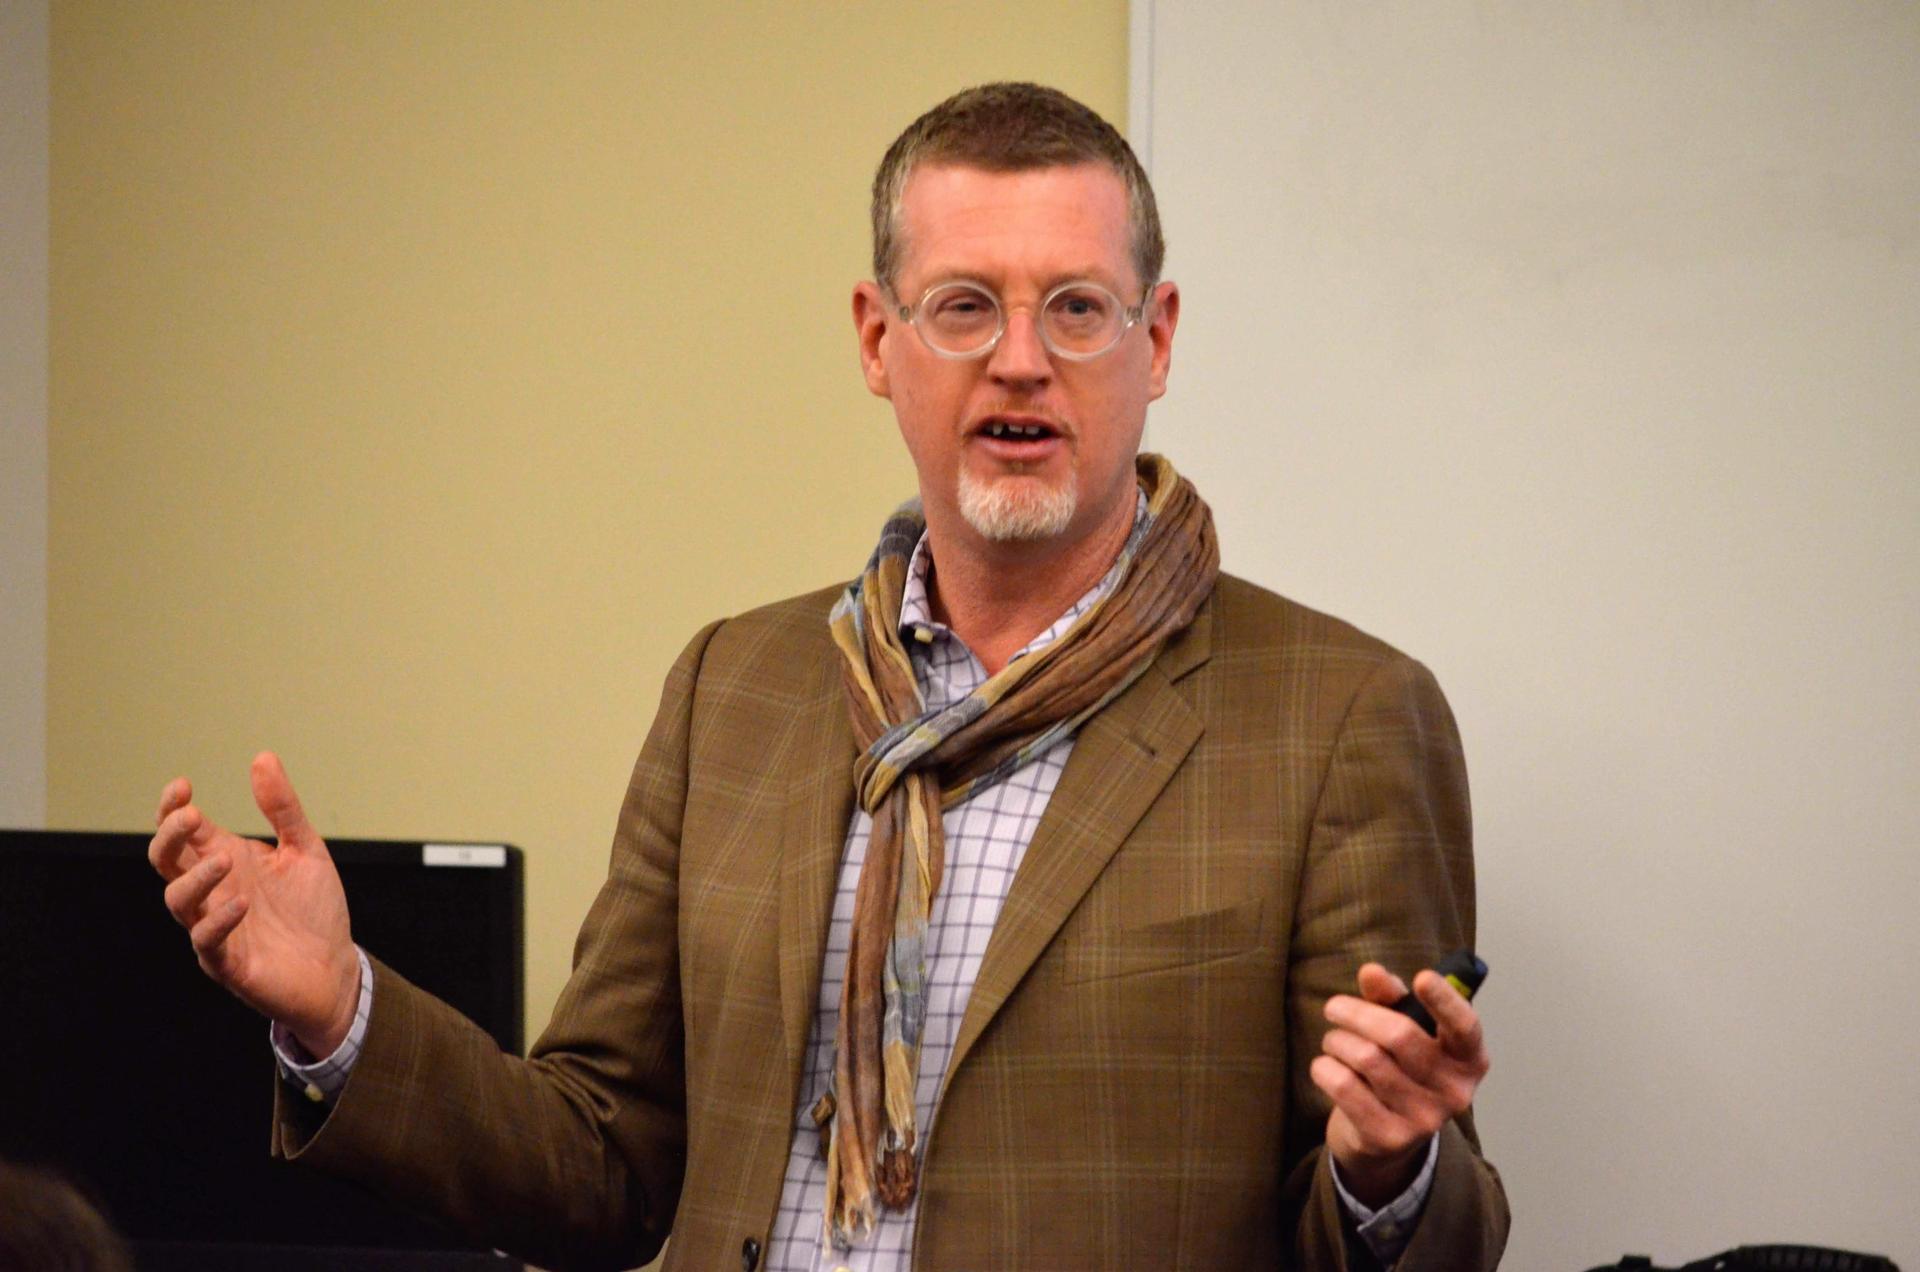 Dr. Alan Daly - UC San Diego